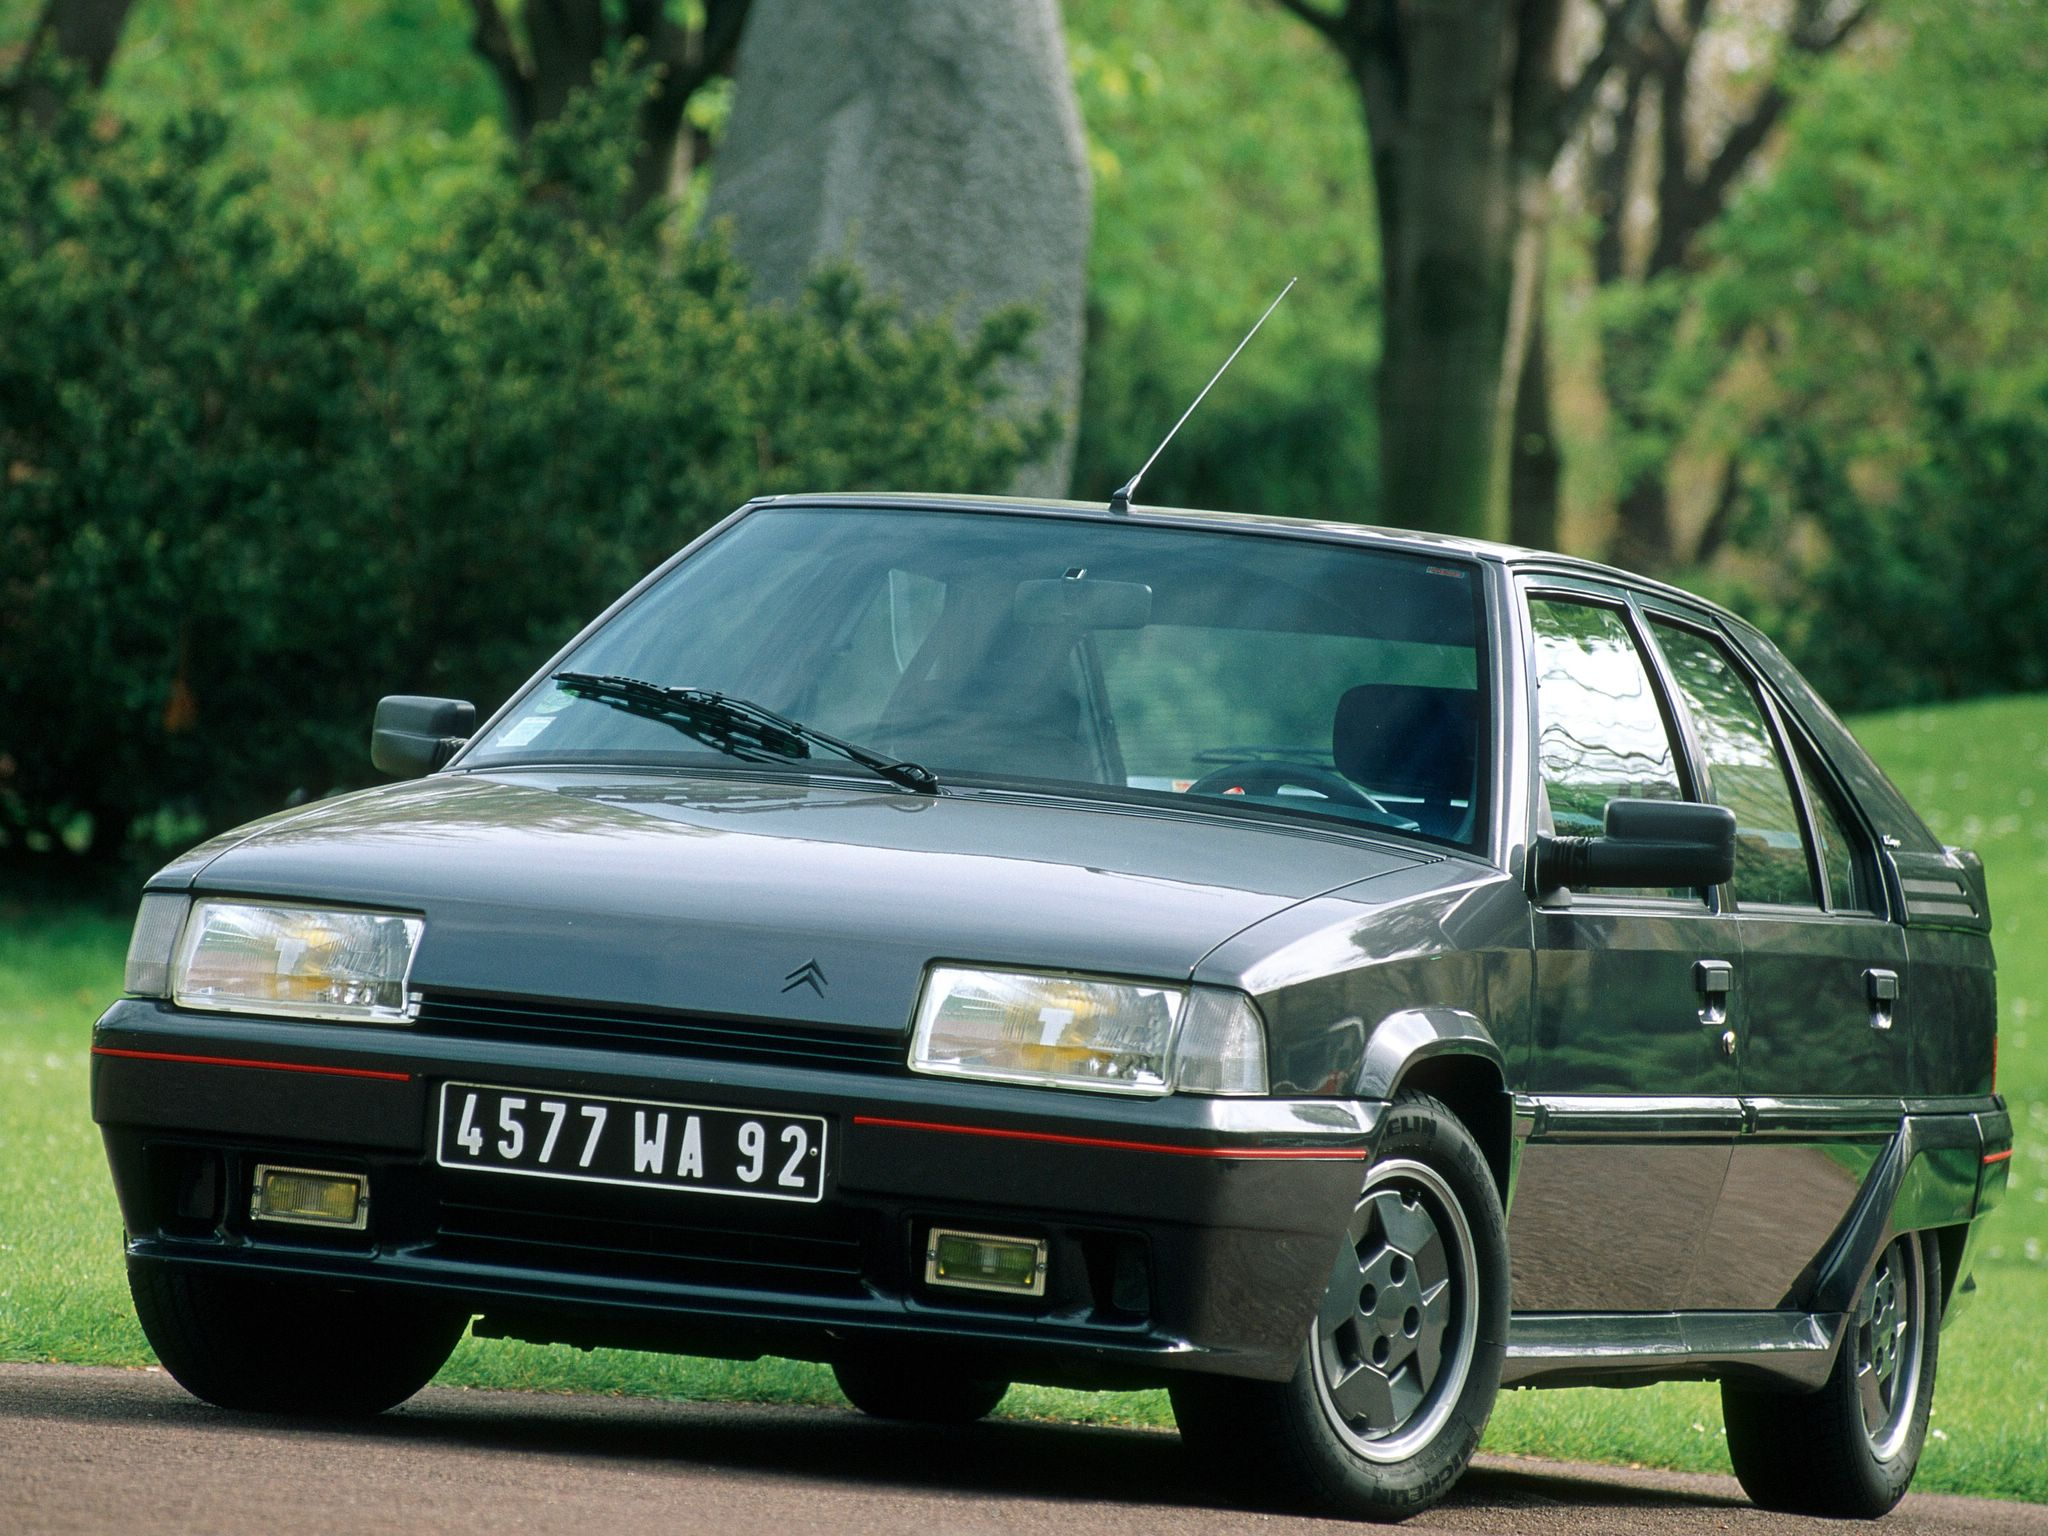 CITROEN BX - 1989, 1990, 1991, 1992, 1993 - autoevolution